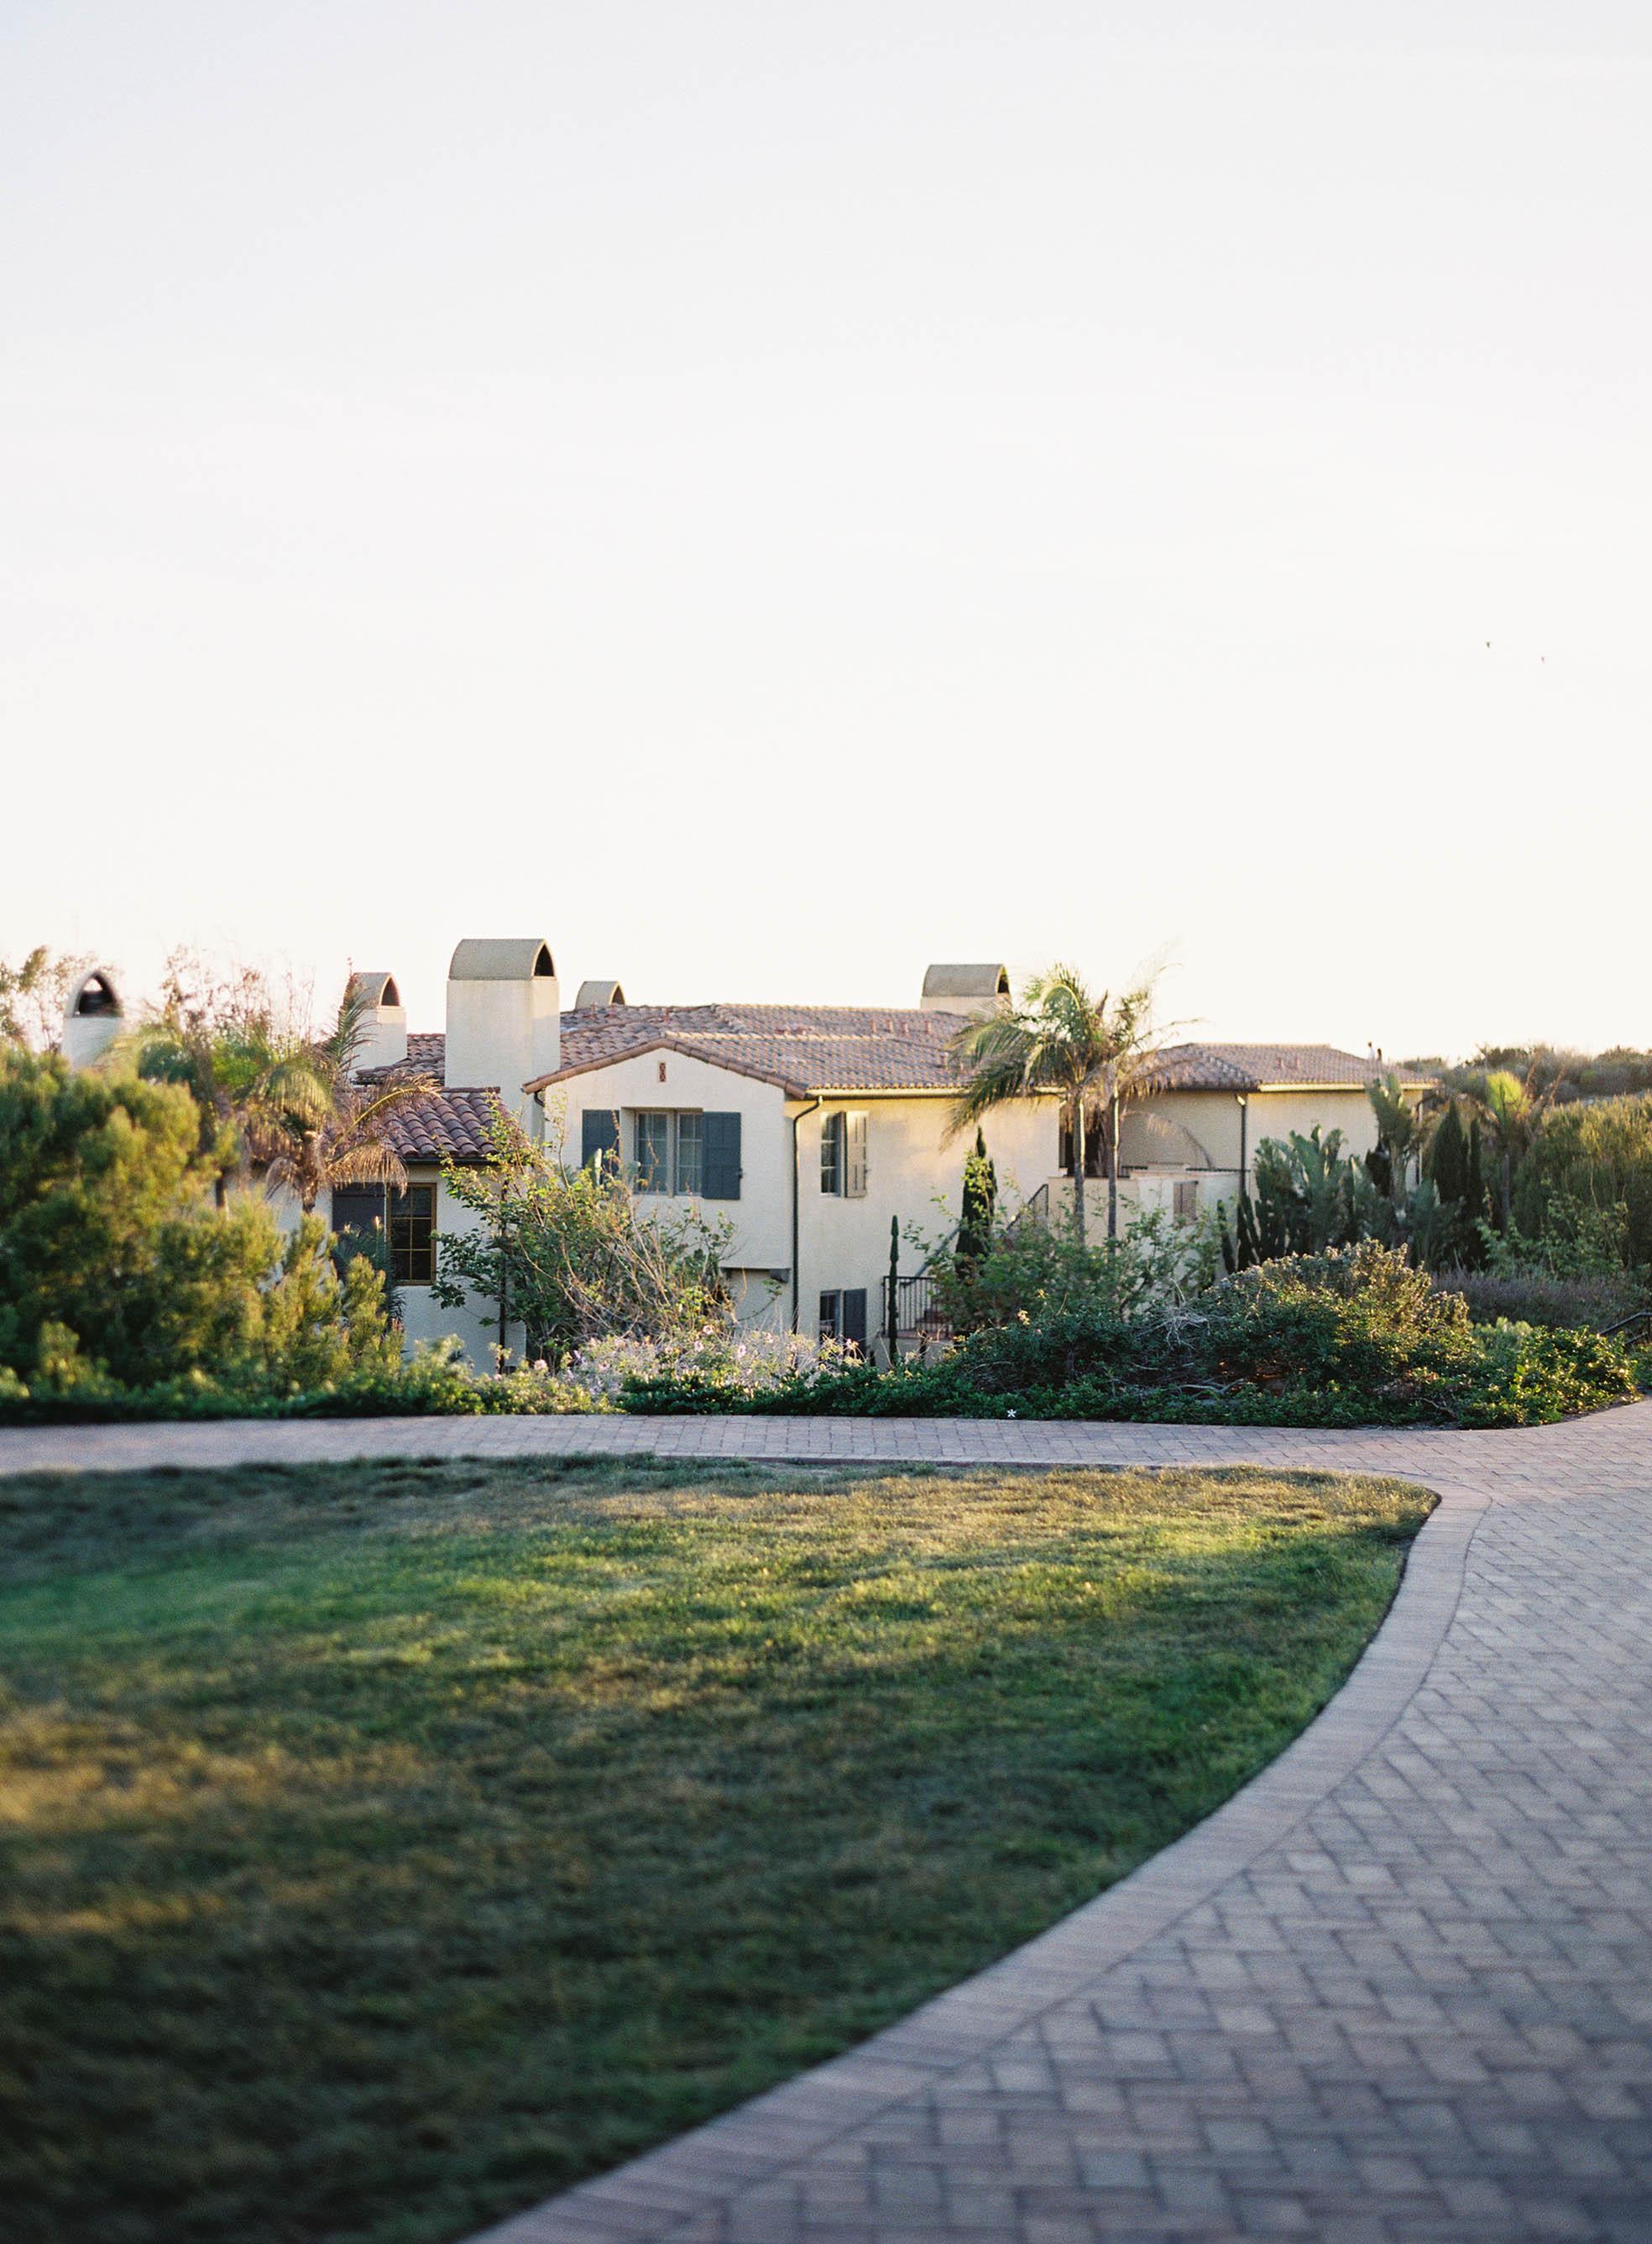 Meghan Mehan Photography - Fine Art Film Photographer   California   San Francisco   Napa   Sonoma   Santa Barbara   Rancho Palos Verdes - 006.jpg